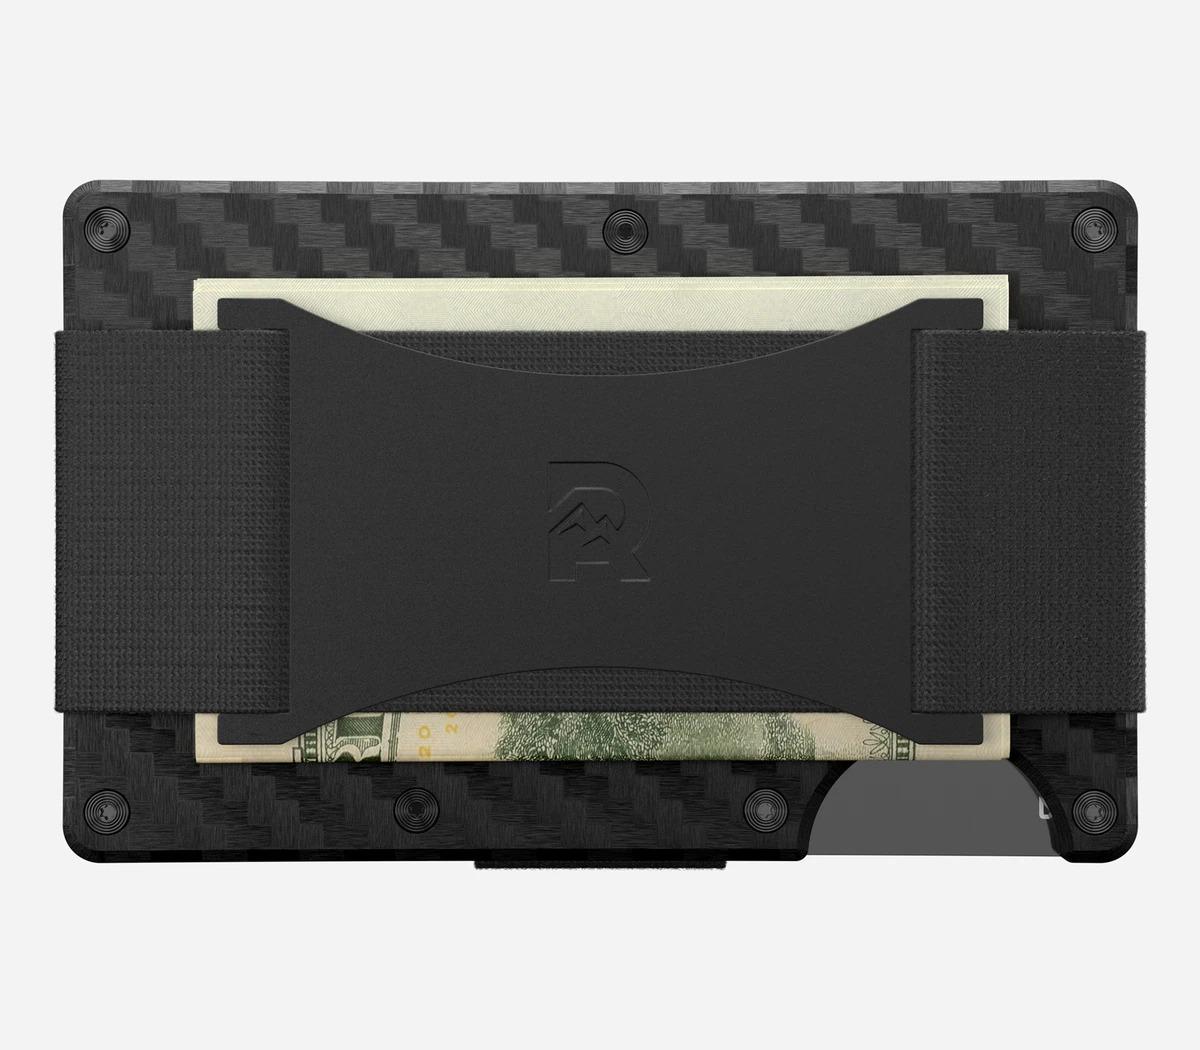 The Ridge Carbon Fiber 3K Wallet